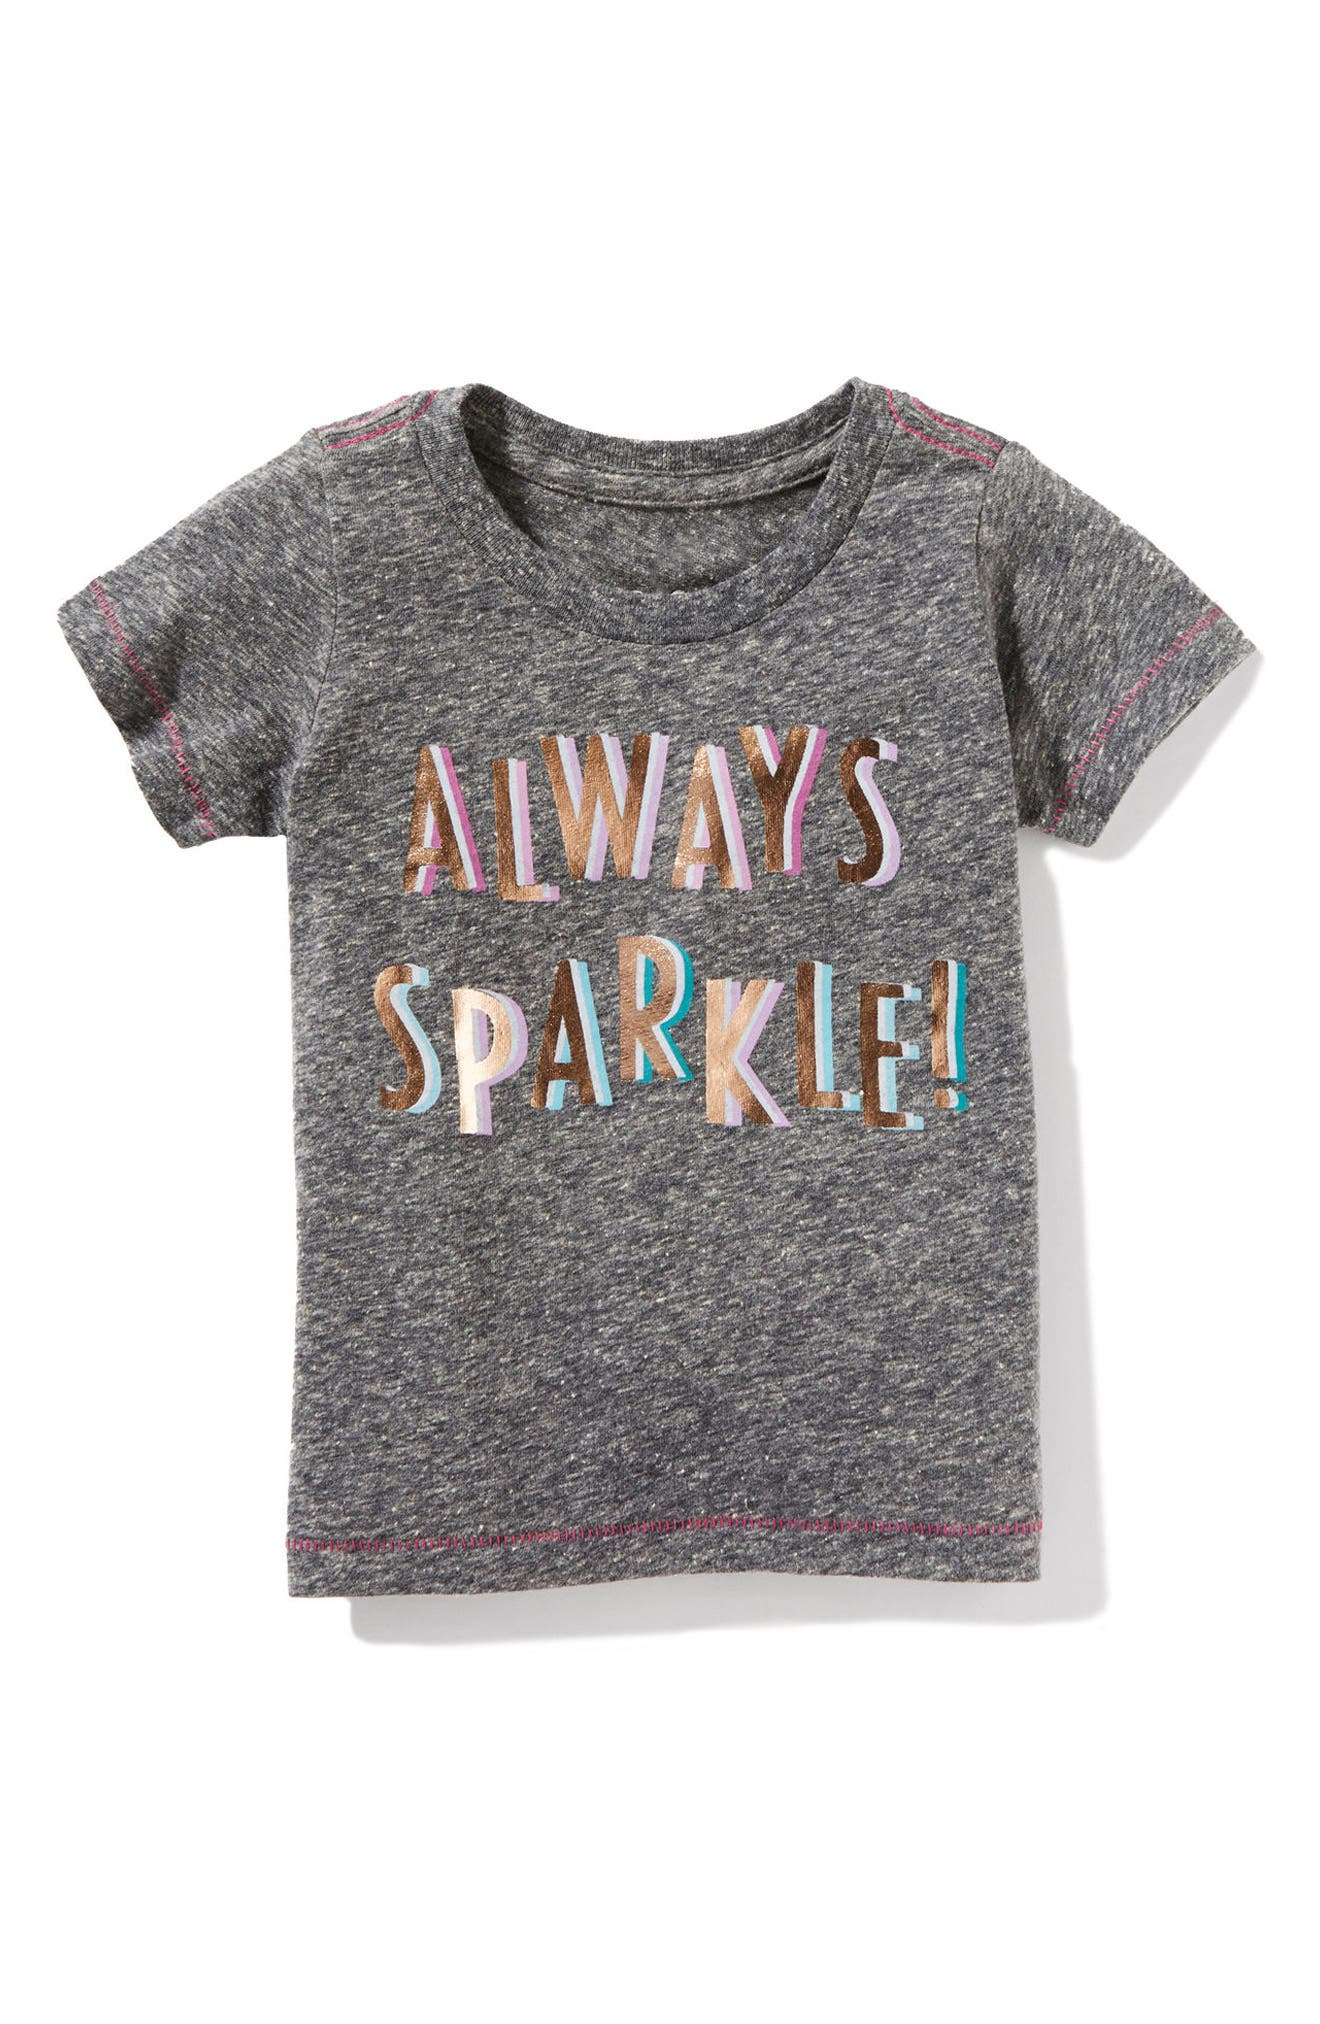 Main Image - Peek Always Sparkle Graphic Tee (Baby Girls)